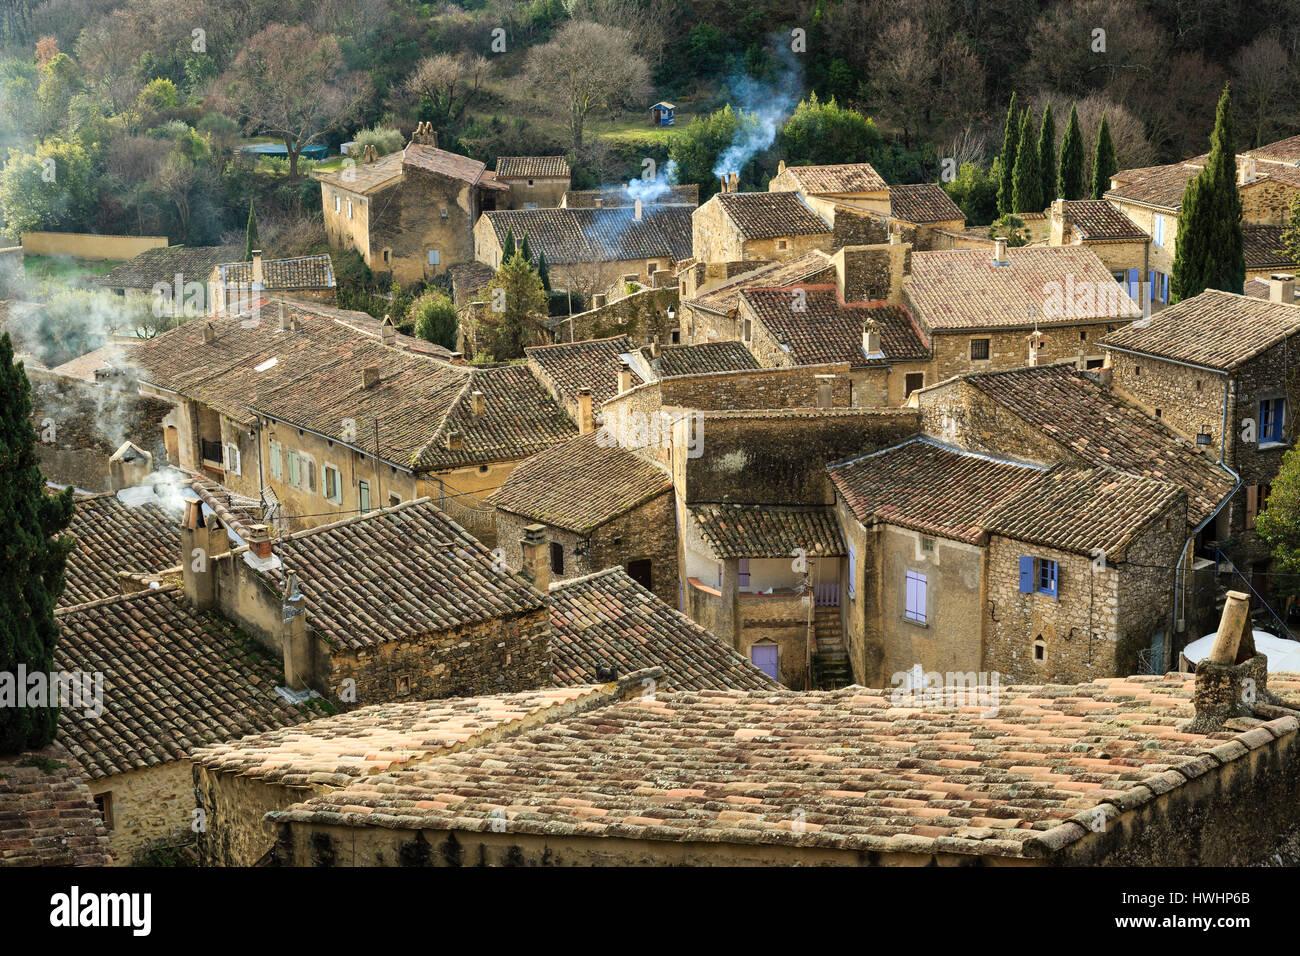 France, Ardeche, Saint Montan - Stock Image